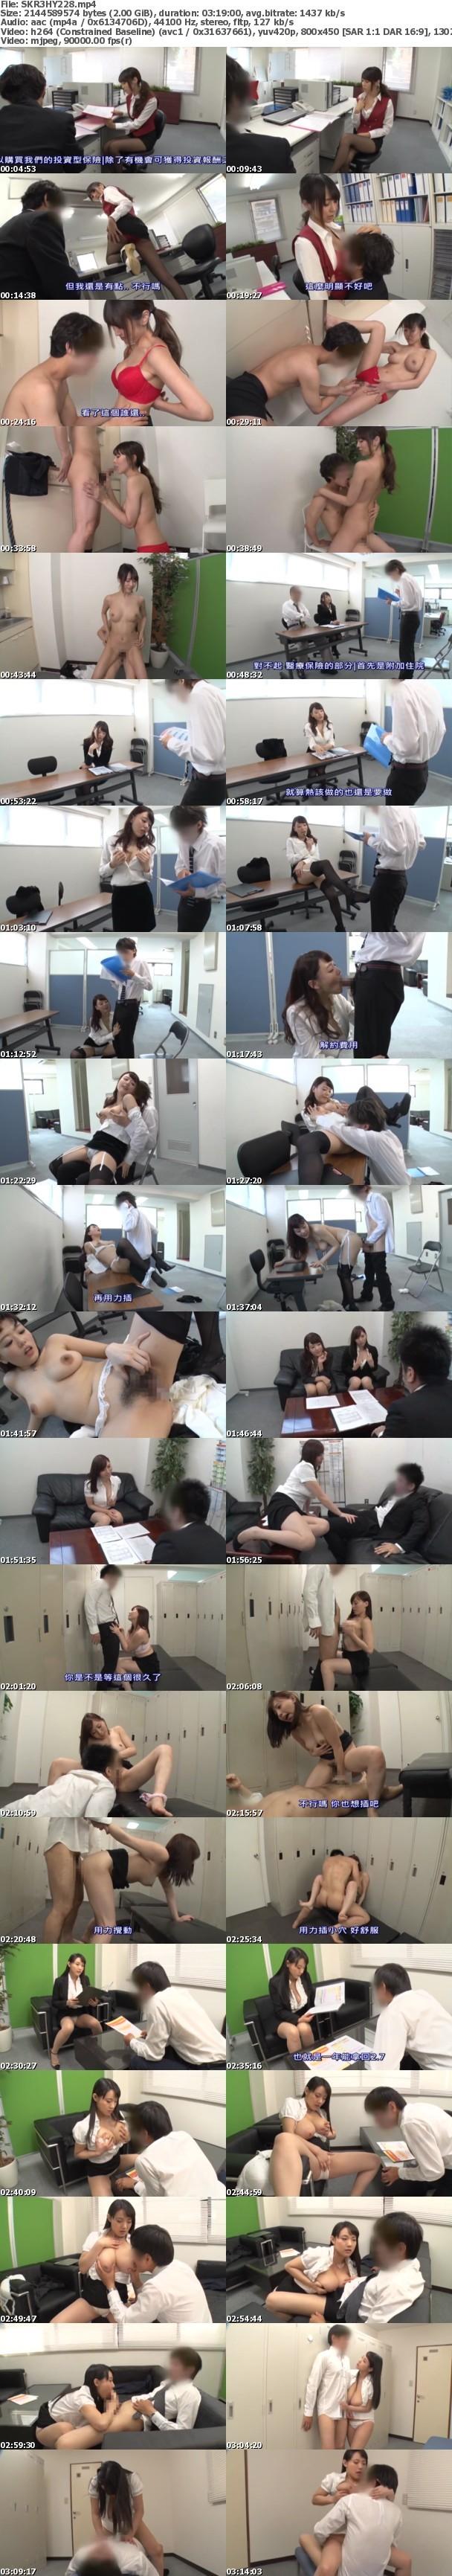 SCPX-228 在職女員工都是巨乳!靠露胸露內褲來提高業績的傳說中的巨乳迷你裙企業對色鬼的挑逗指南[中文字幕]